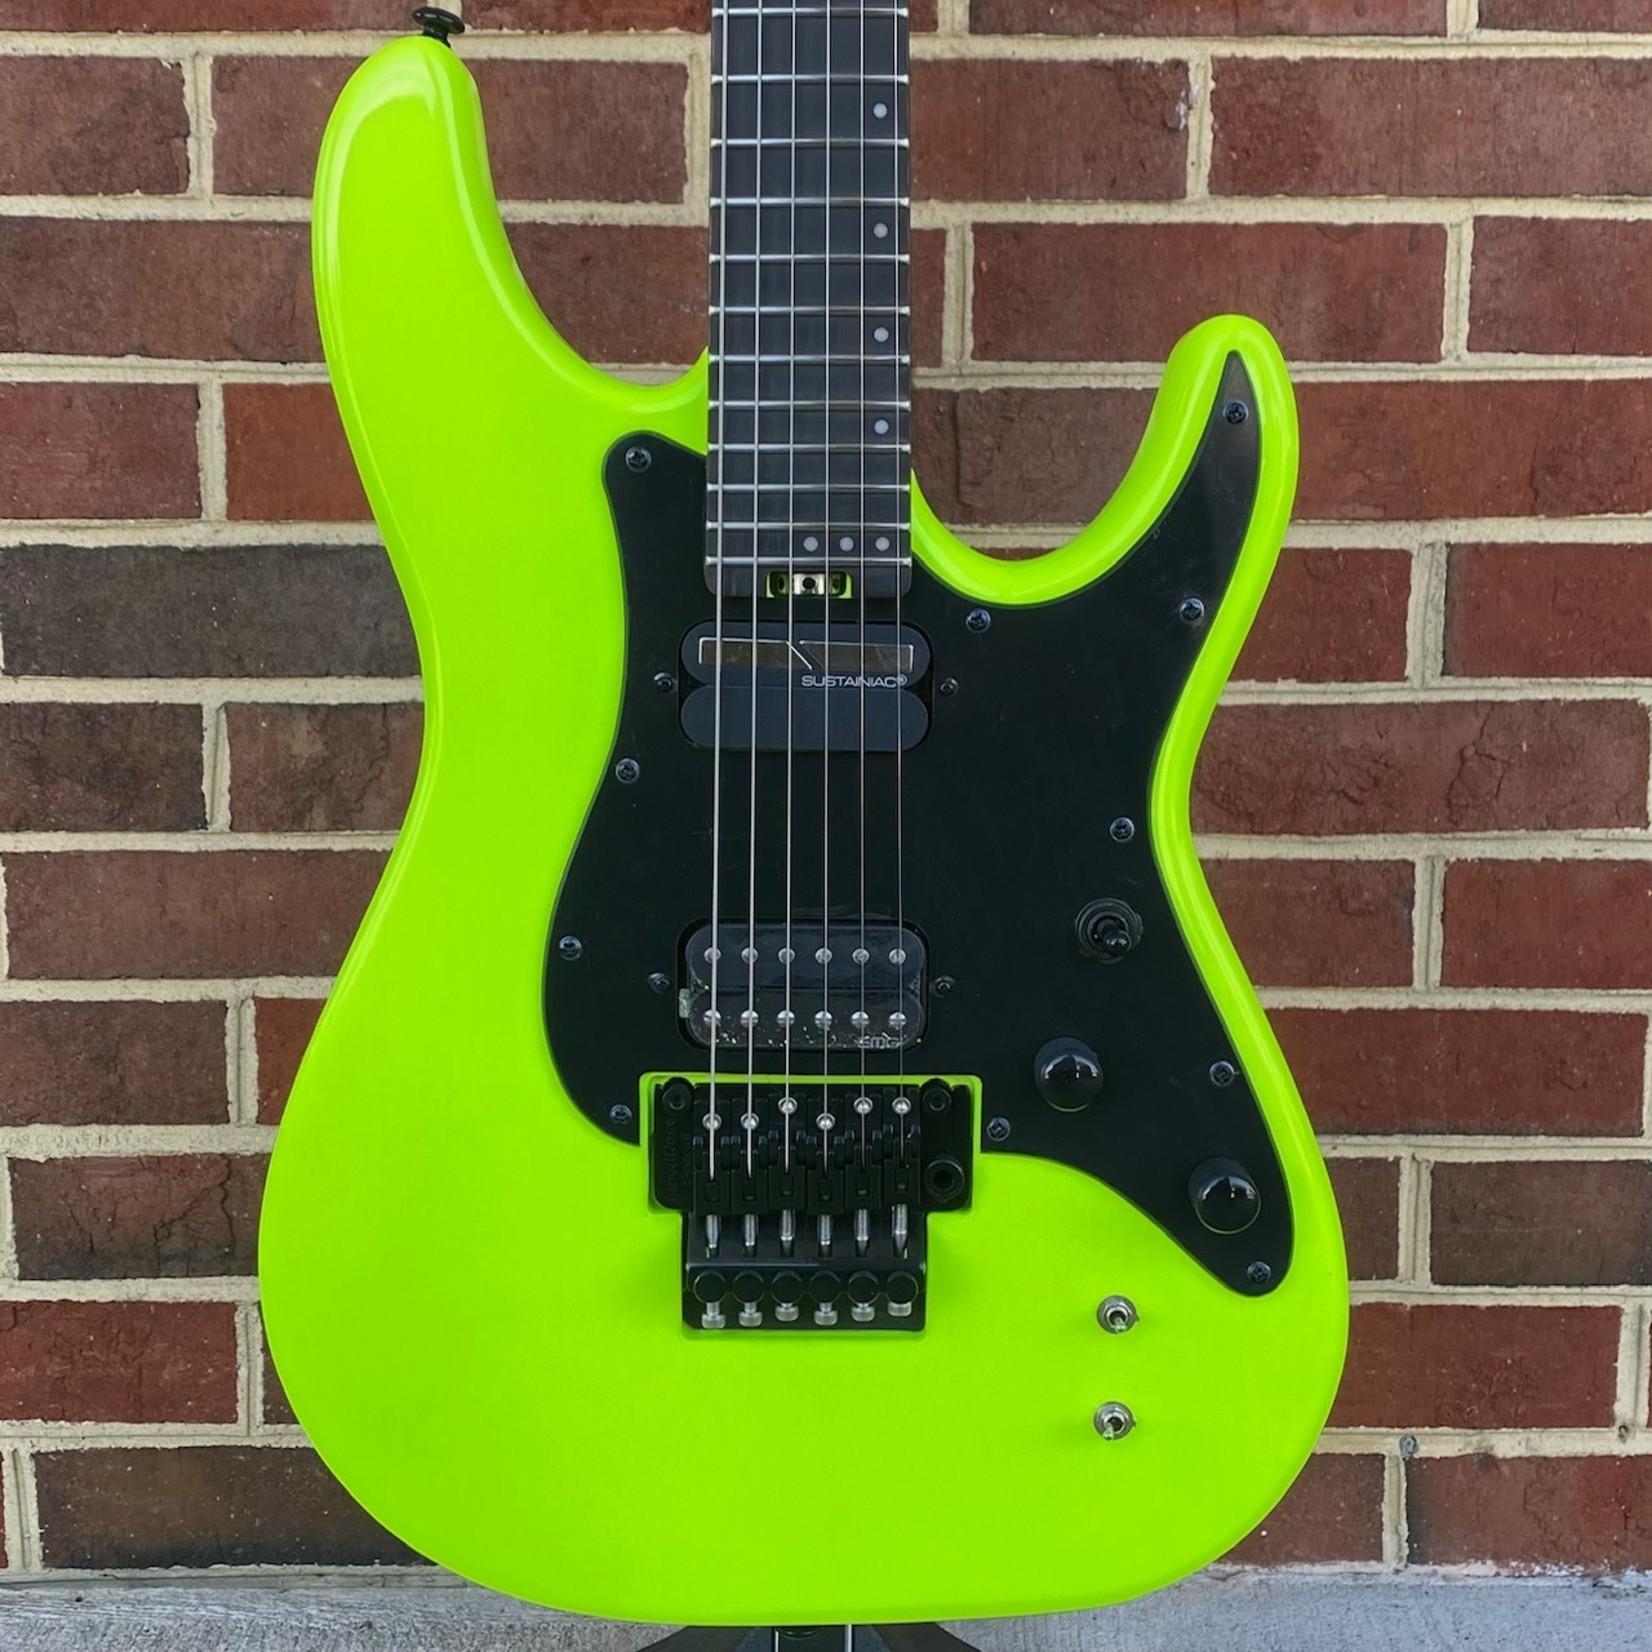 "Schecter Guitar Research Schecter Sun Valley Super Shredder FR, Birch Green, Floyd Rose Special ""Hot Rod"" Trem, EMG Retro Active Bridge Pickup, Sustainiac Neck Pickup, Maple Neck, Maple Fretboard"